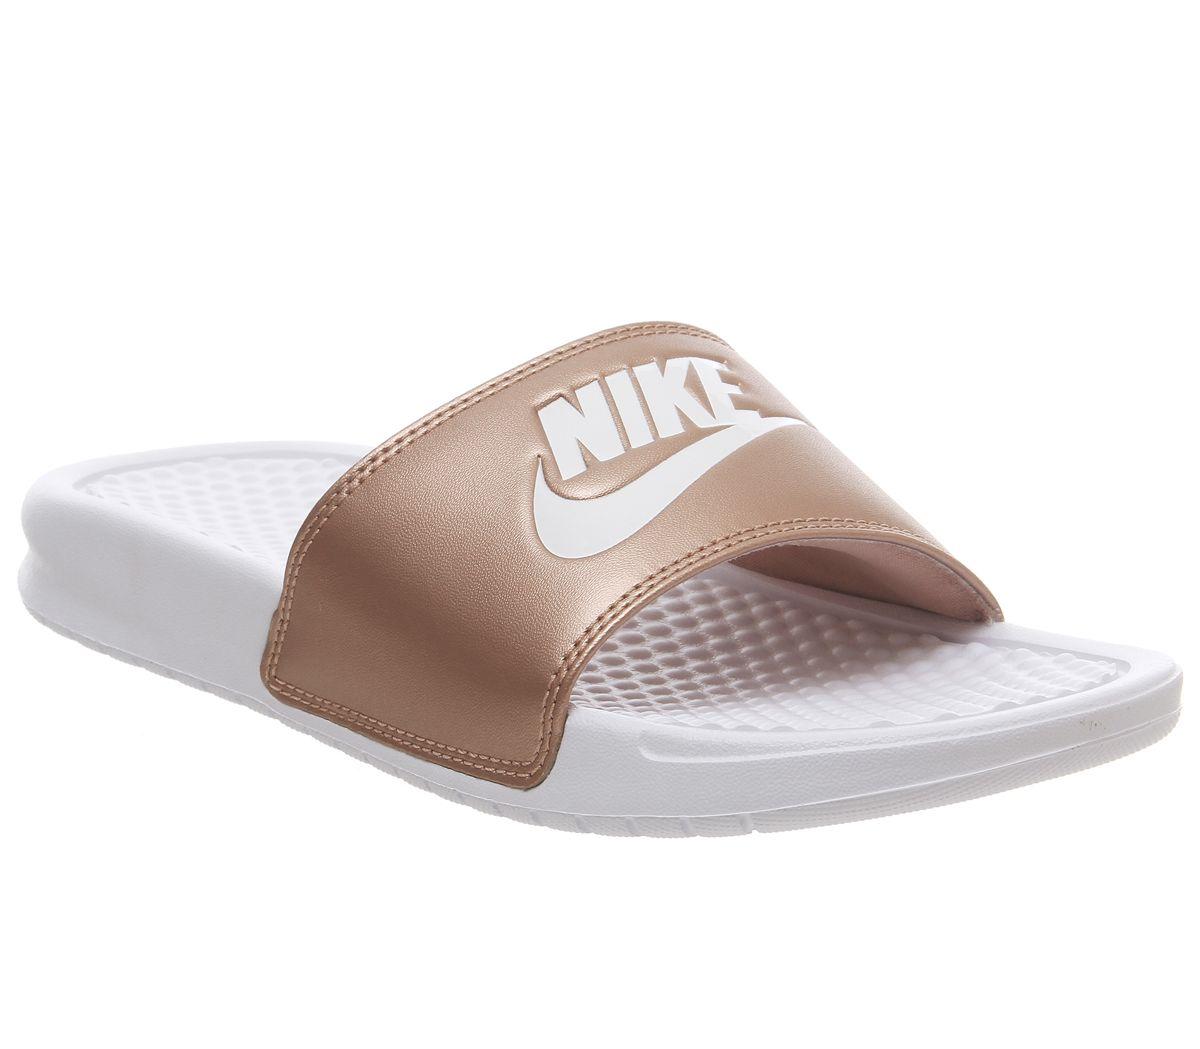 54c7504ba Nike Benassi Sliders White White Metallic Red Bronze Jdi F - Sandals